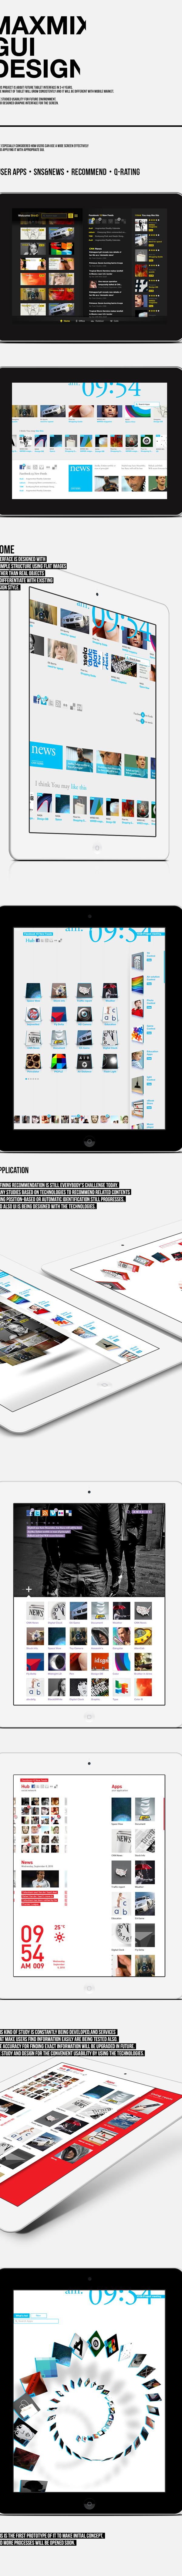 MAXMIX. Concept GUI & Motion on Behance